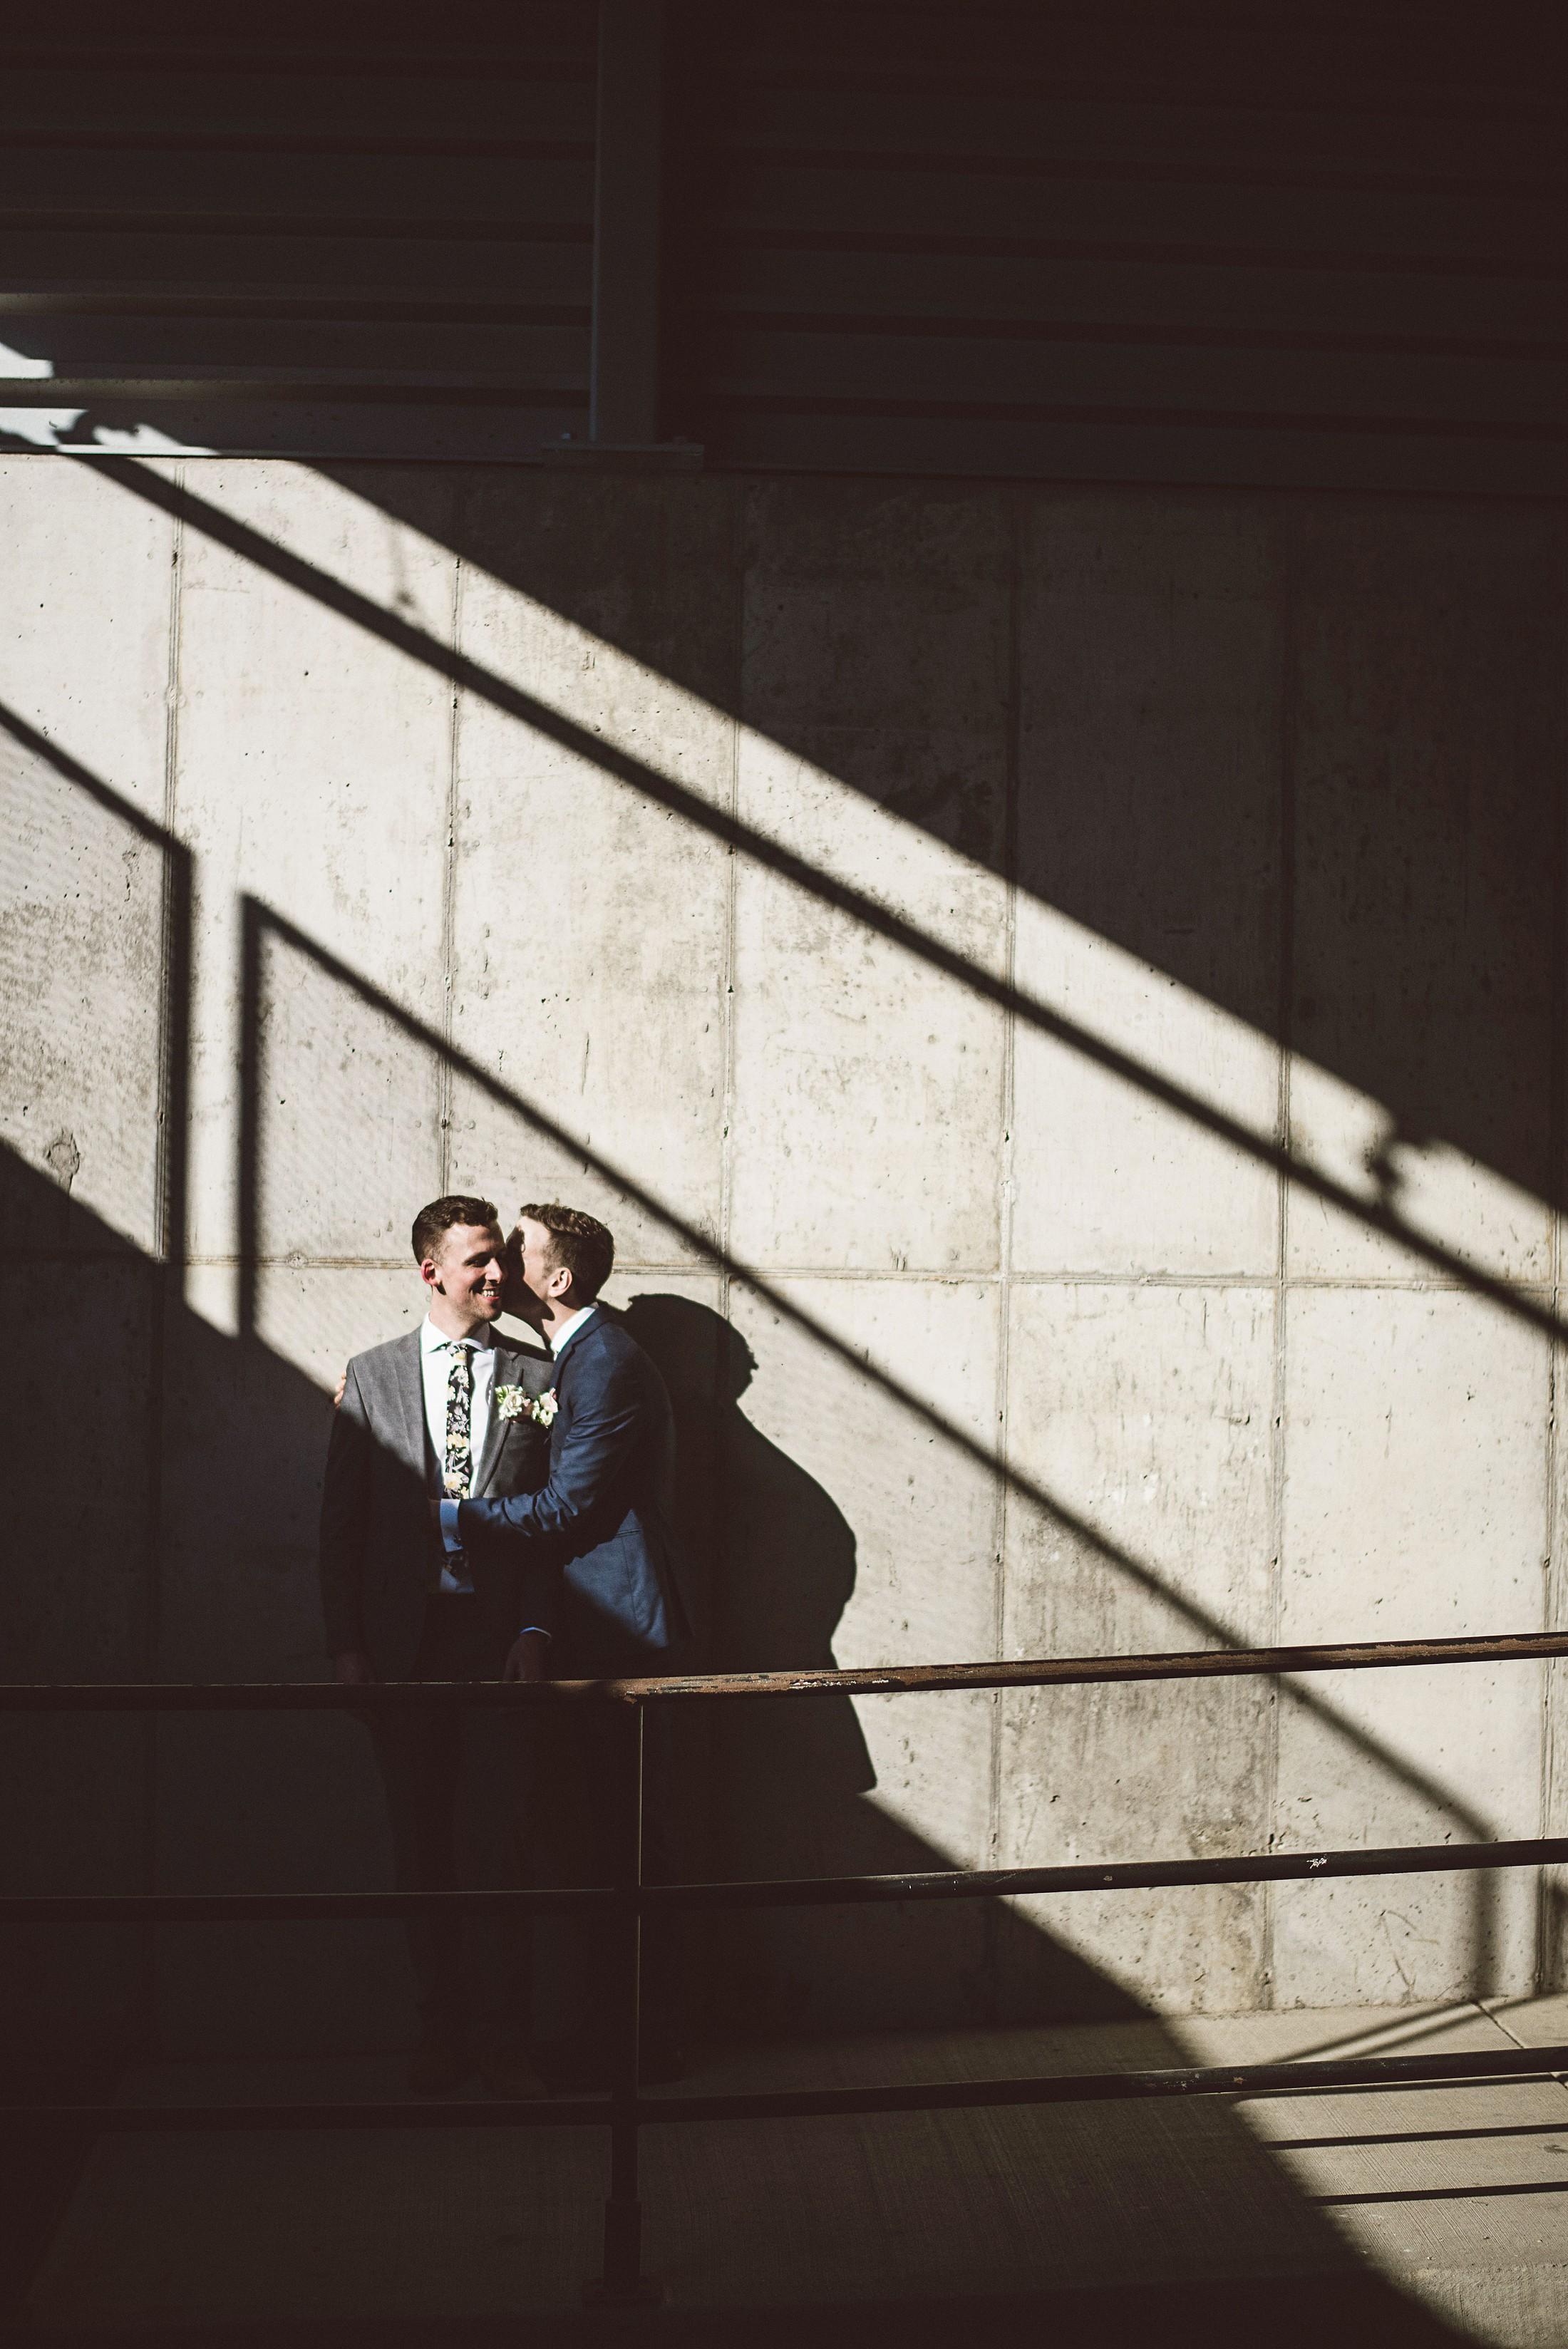 lgbt_wedding_minneapolis_photo_by_lucas_botz_photography_2018-01-04_0007.jpg